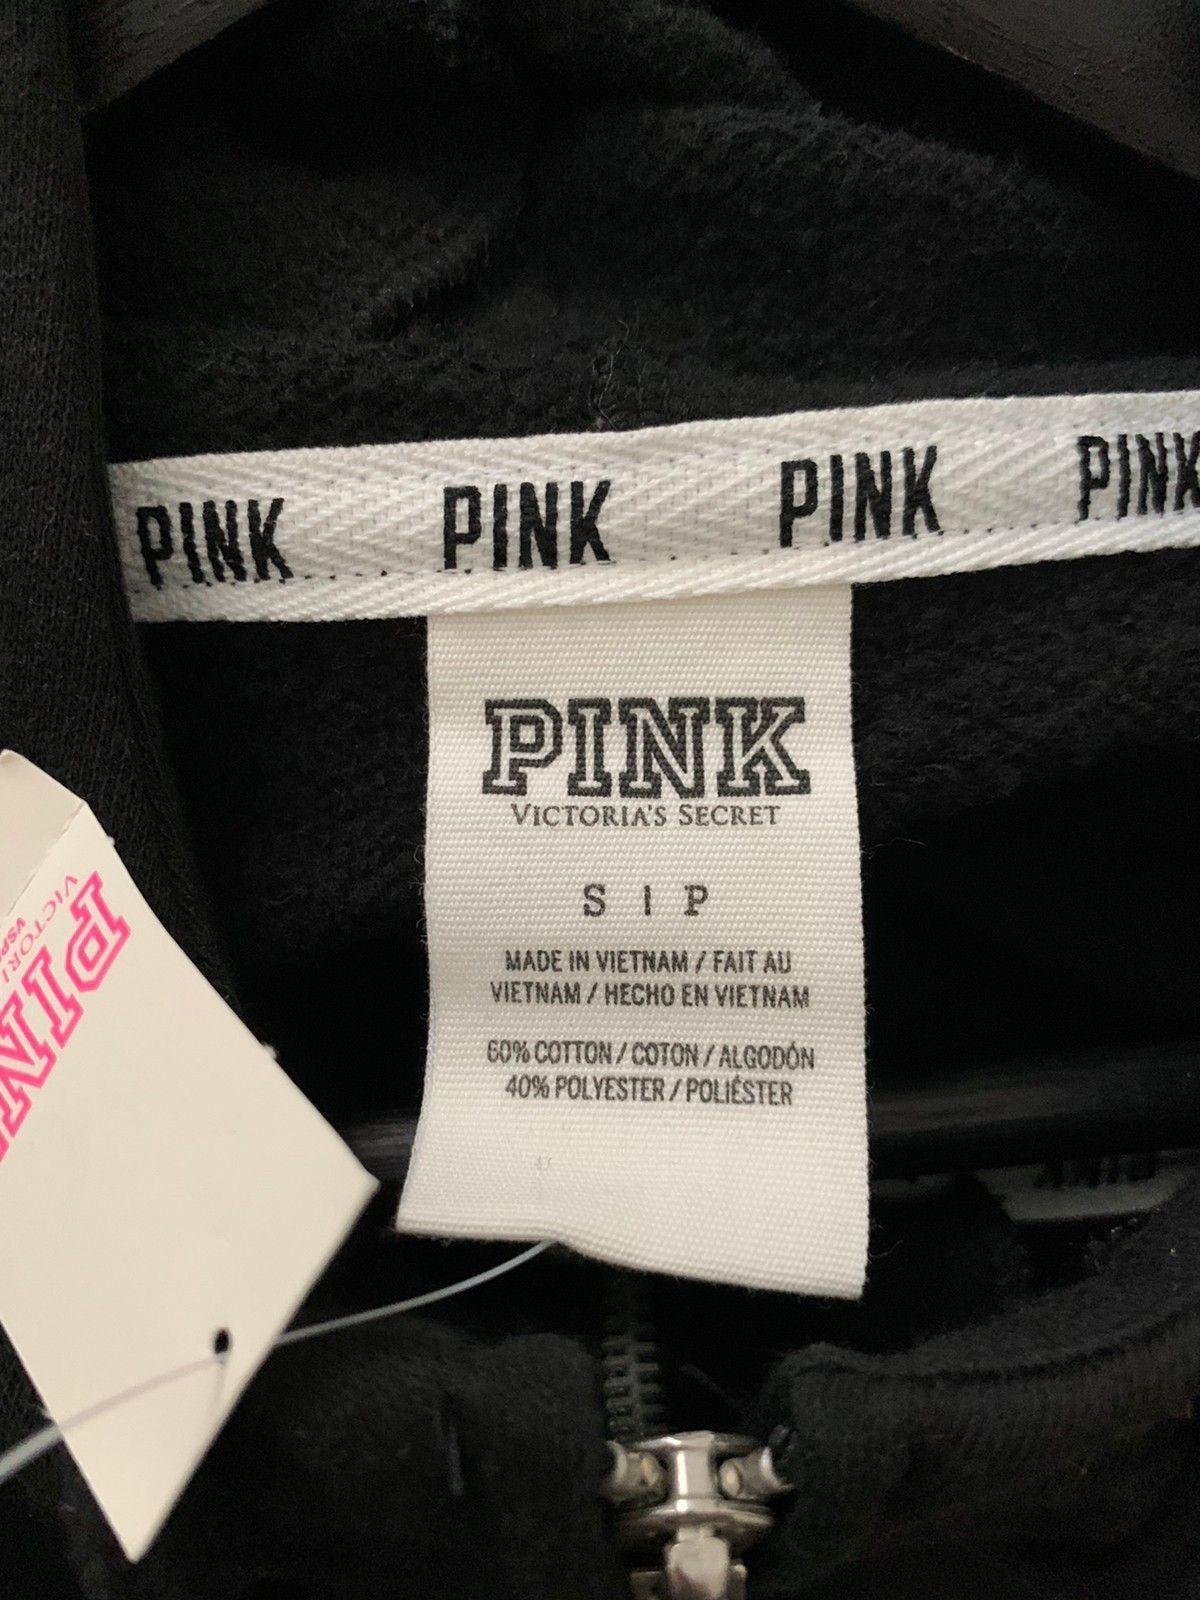 Victoria Secret Pink Hawaii Genser | FINN.no